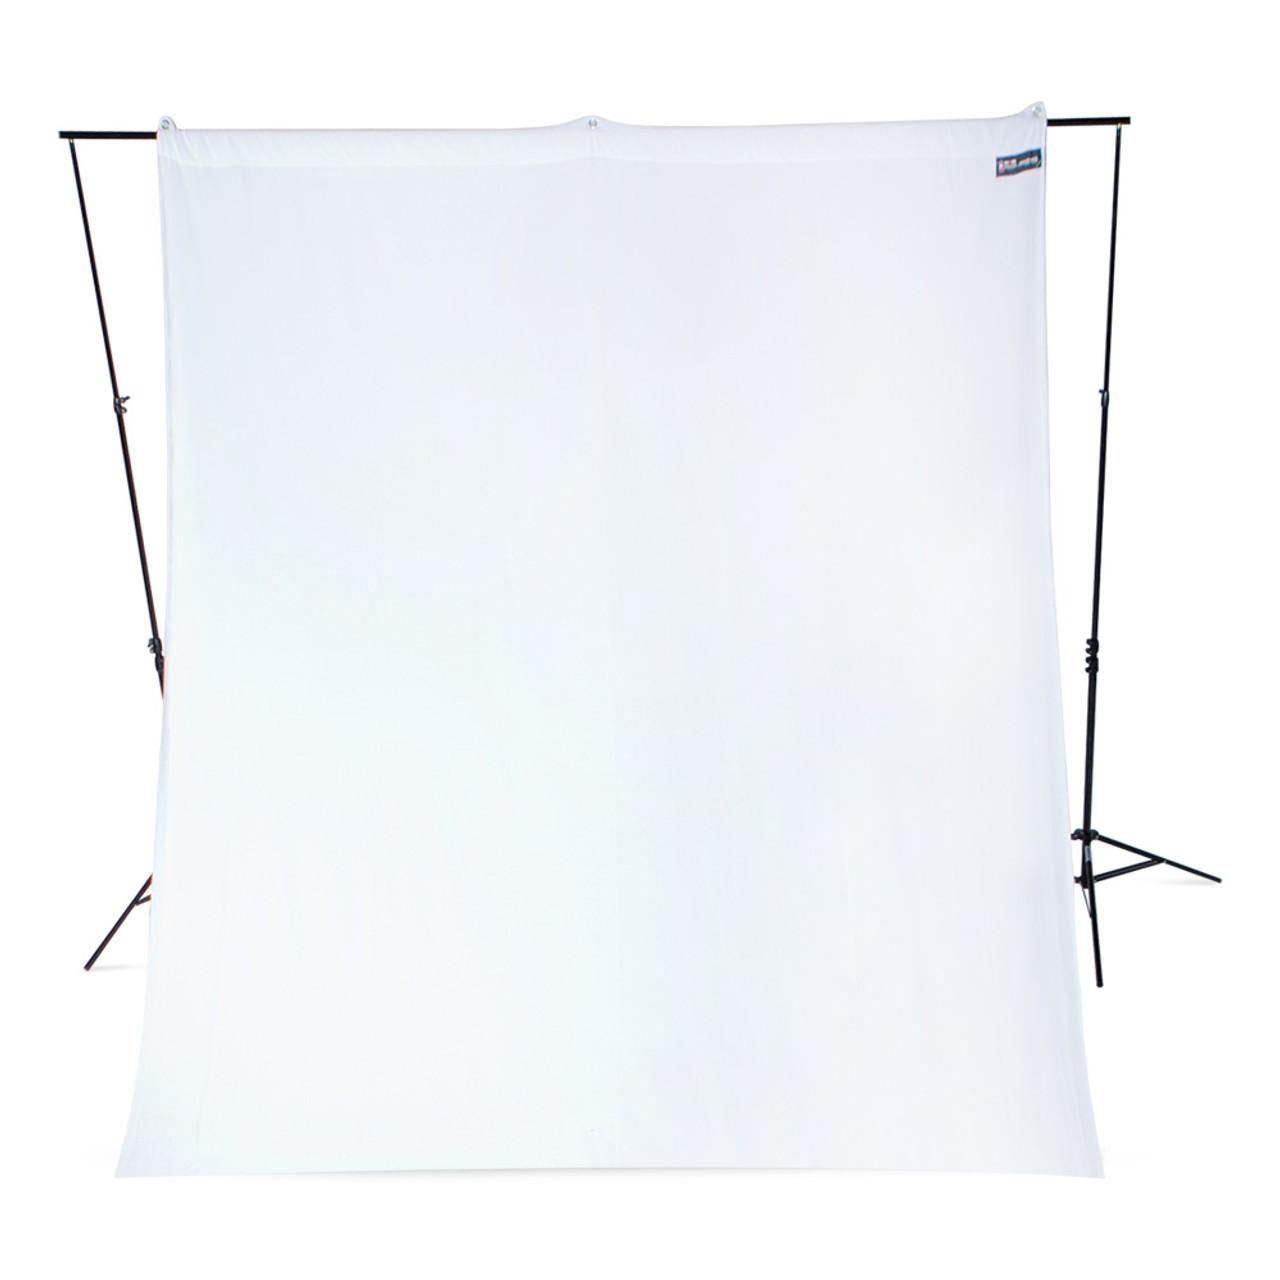 Westcott 9' x 10' White Wrinkle-Resistant Backdrop